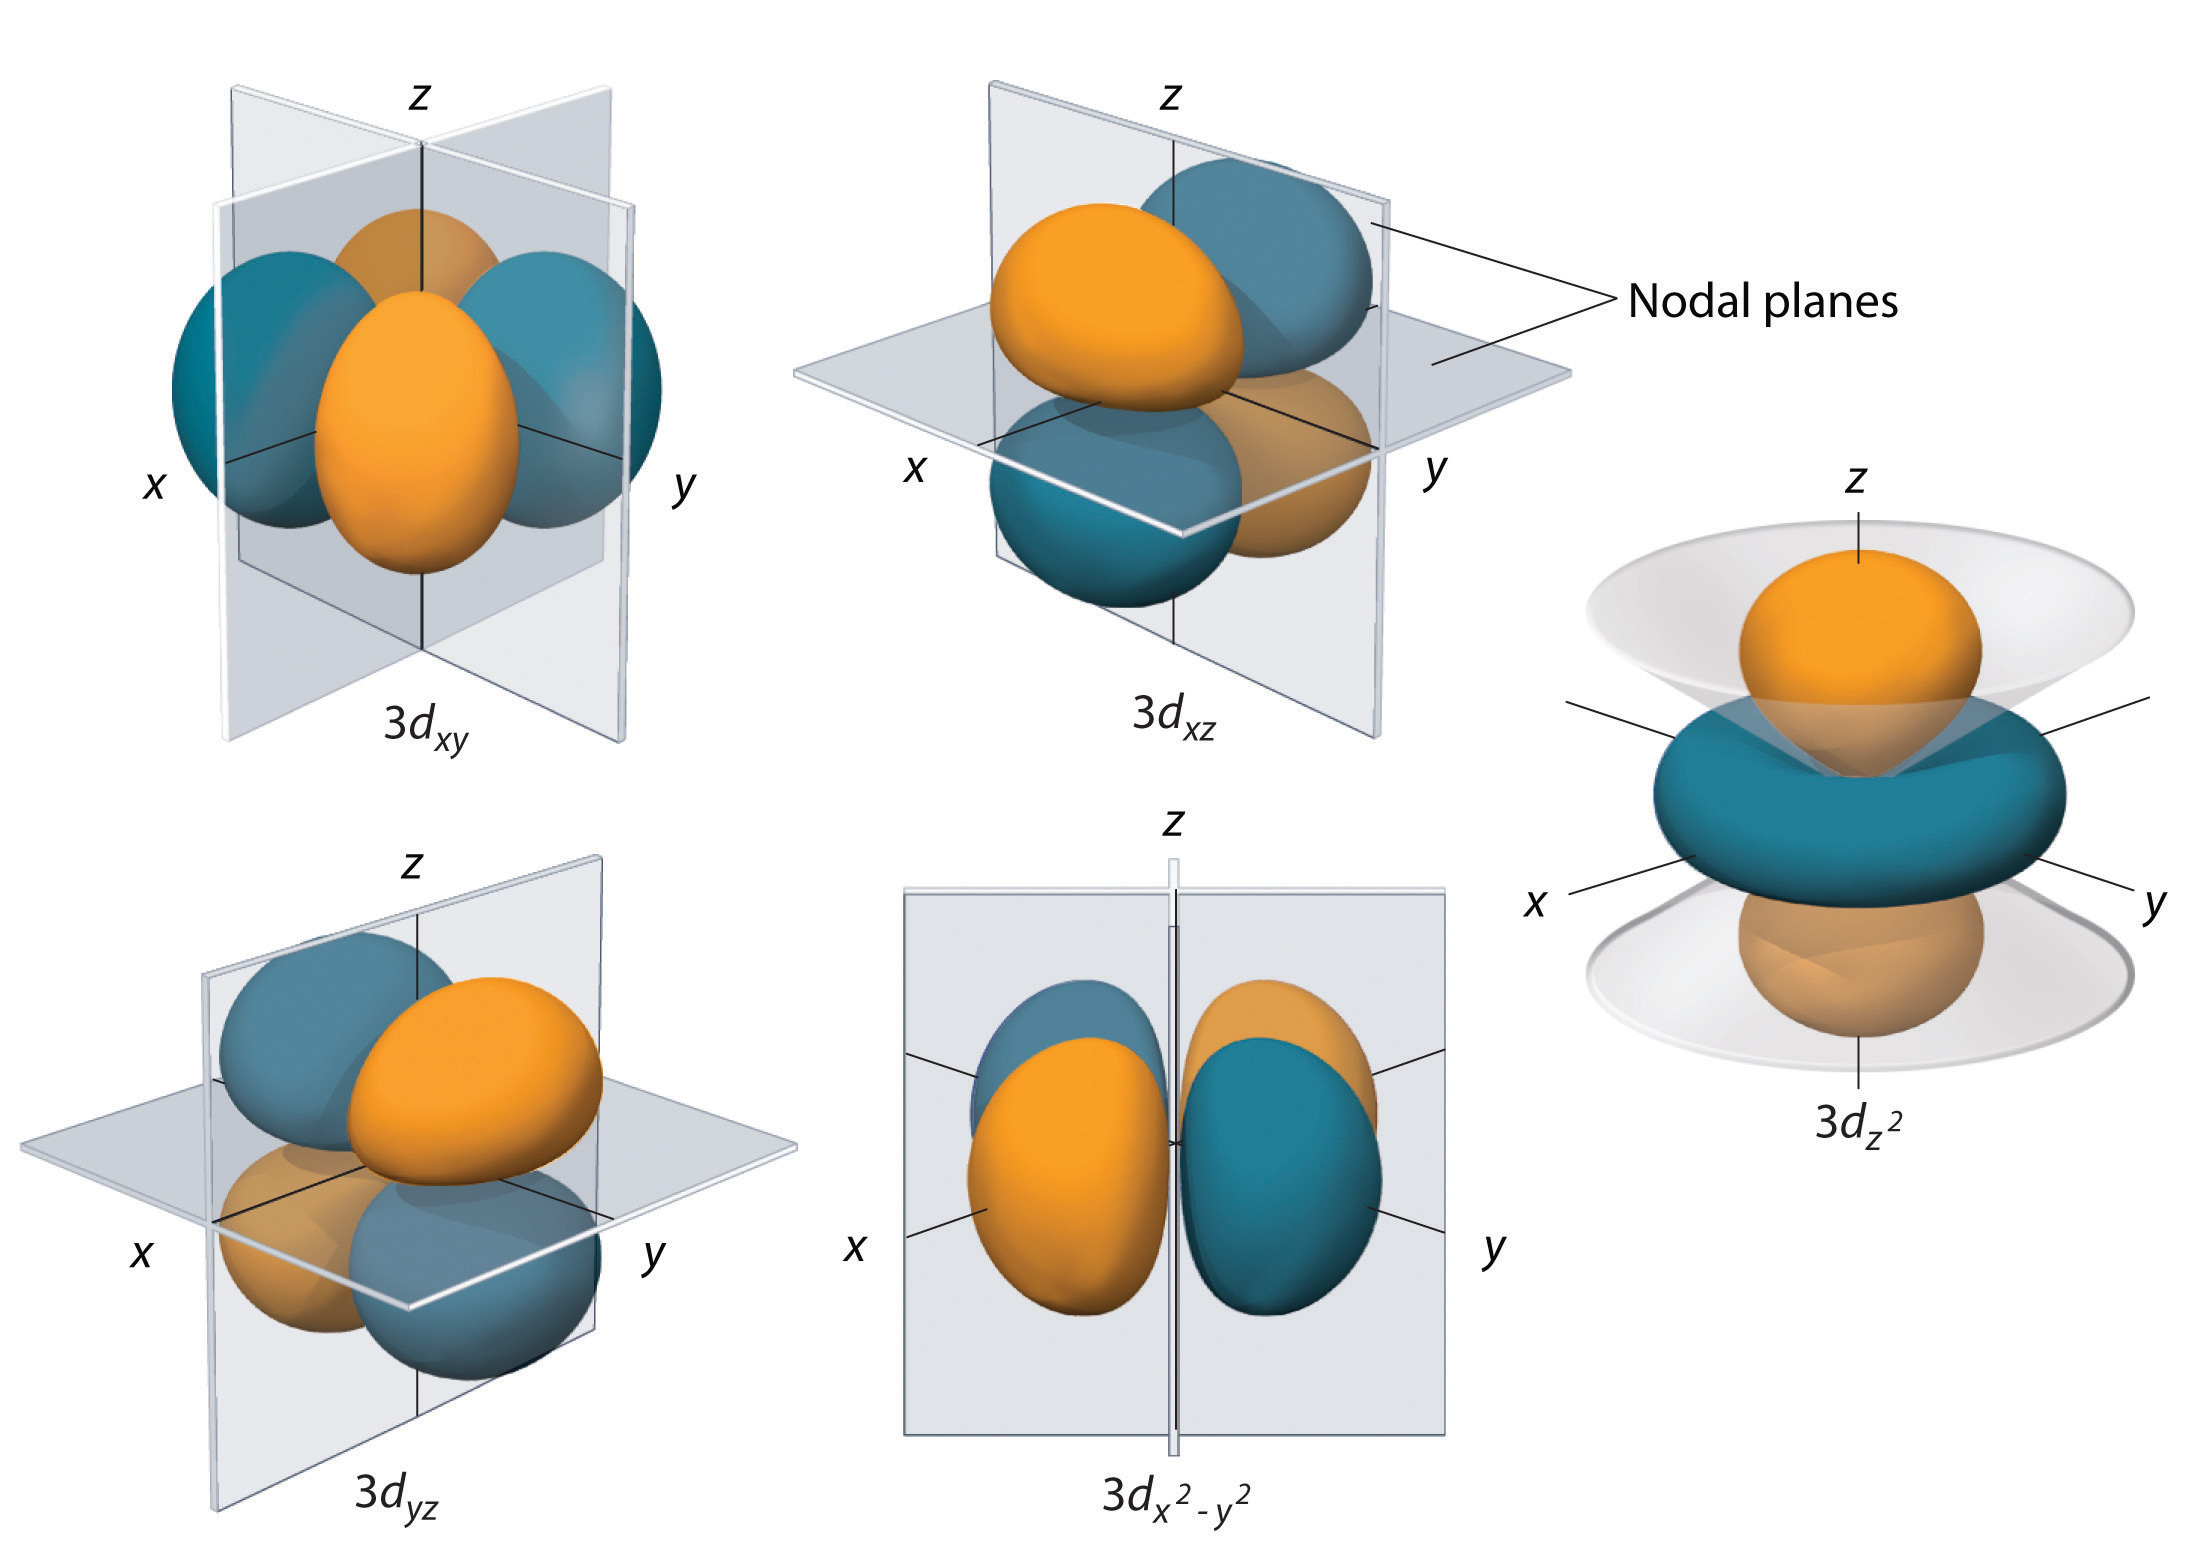 http://2012books.lardbucket.org/books/principles-of-general-chemistry-v1.0/s10-05-atomic-orbitals-and-their-ener.html